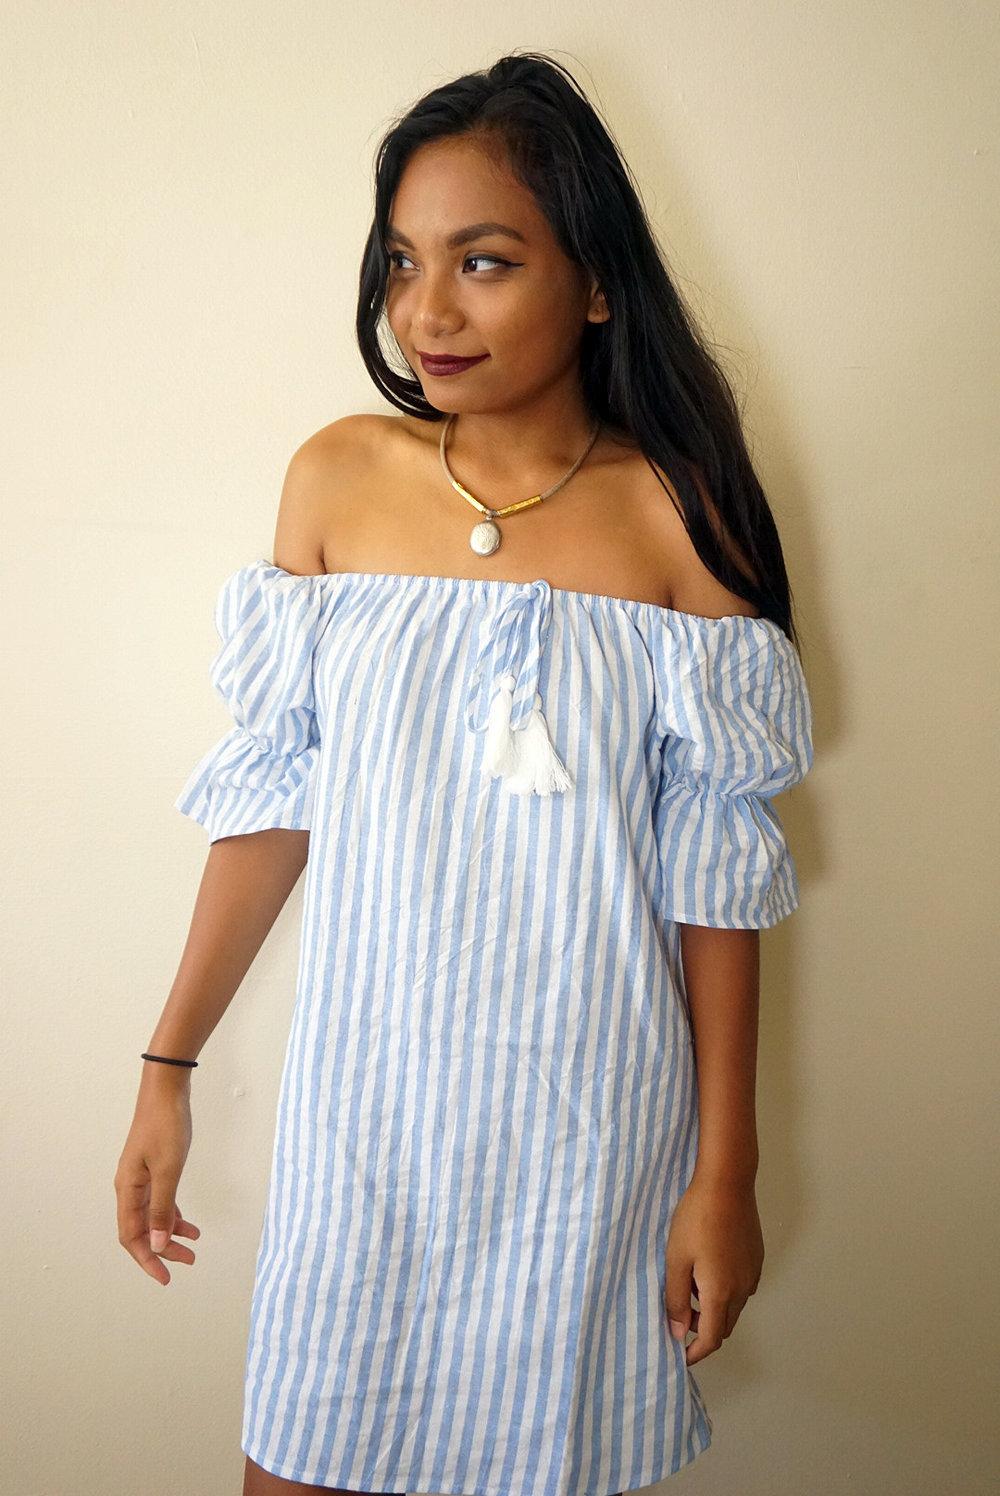 Off-the-shoulder-striped-dress-summer-fall-style-blogger-LINDATENCHITRAN-5-1616x1080.jpg